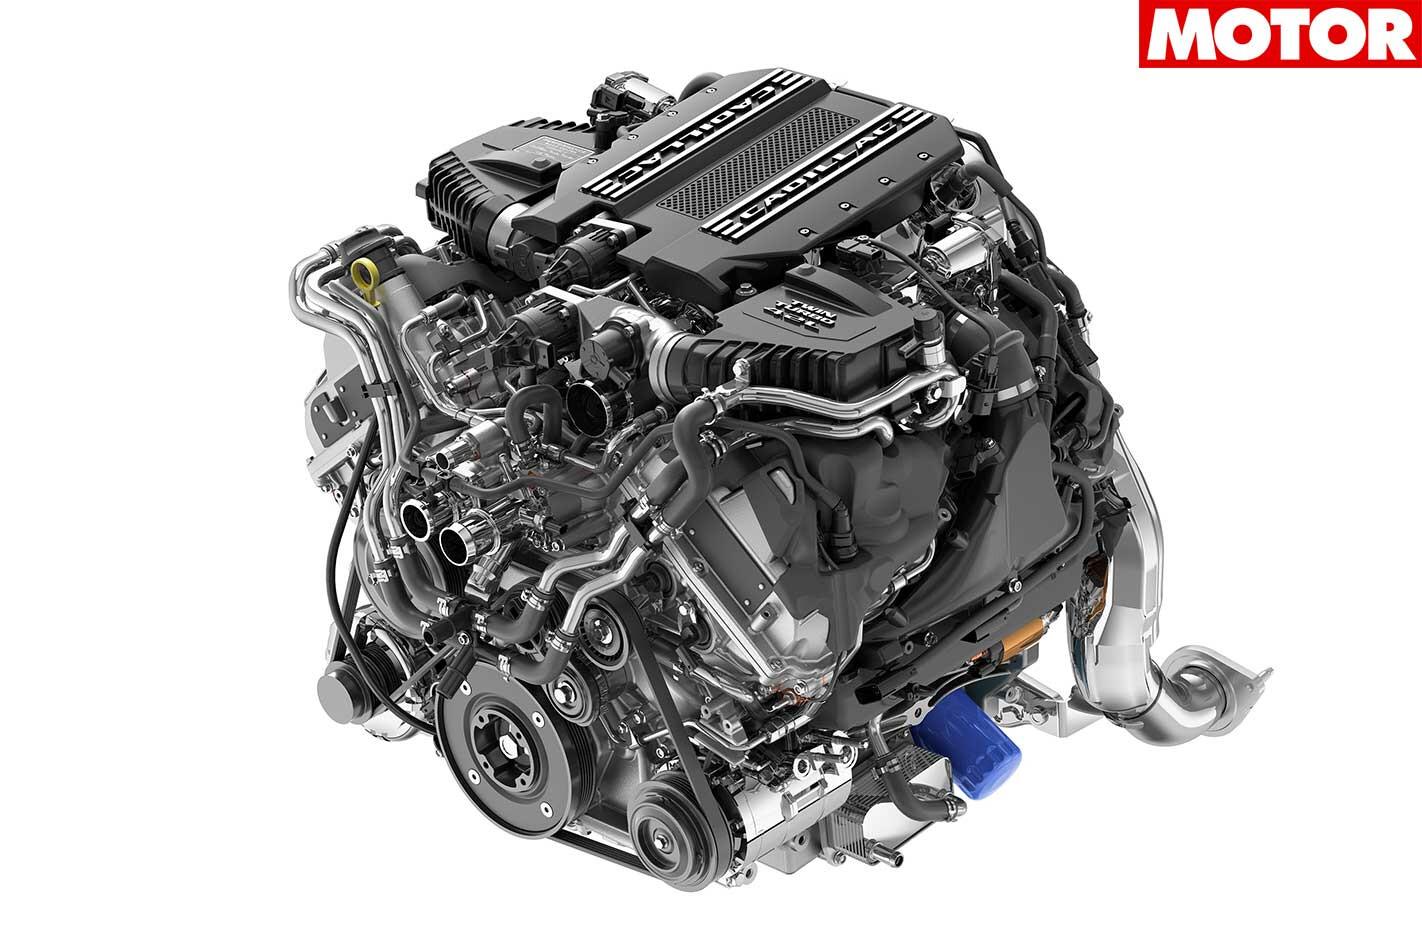 2018 Cadillac Ct 6 V Sport Powertrain Jpg